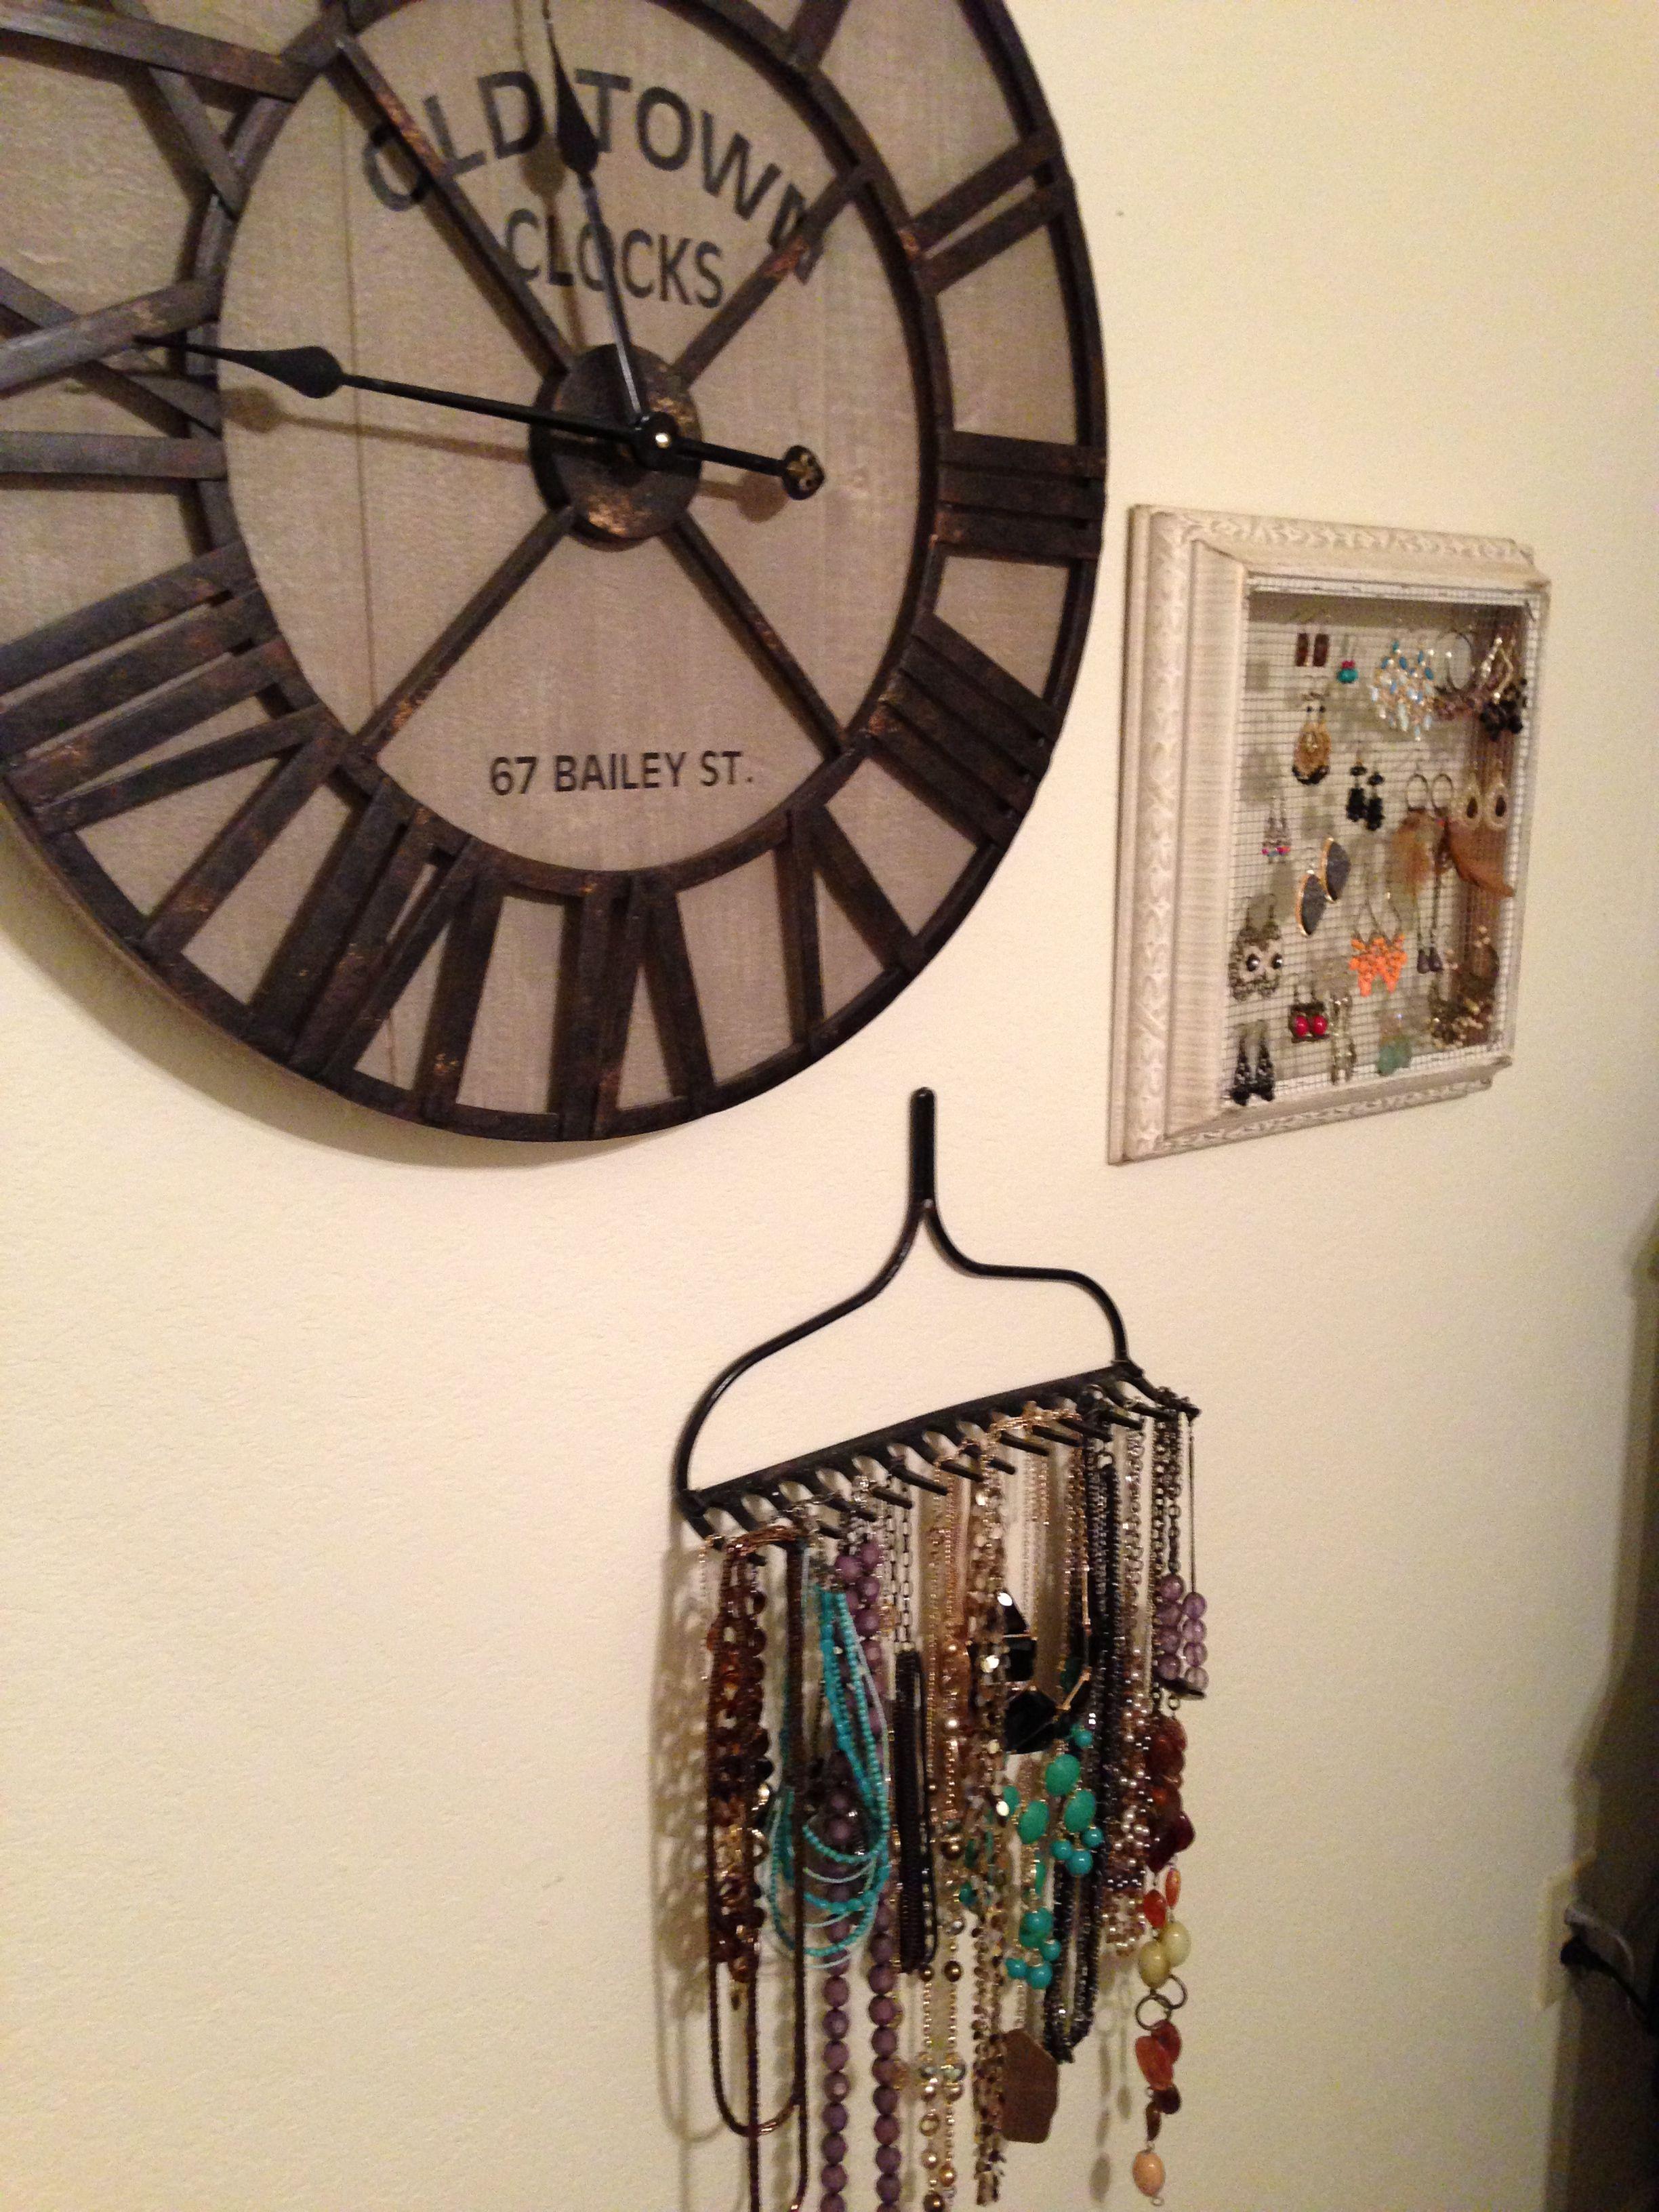 Clock from hobby lobby spray painted metal rake for home for Hobby lobby jewelry holder